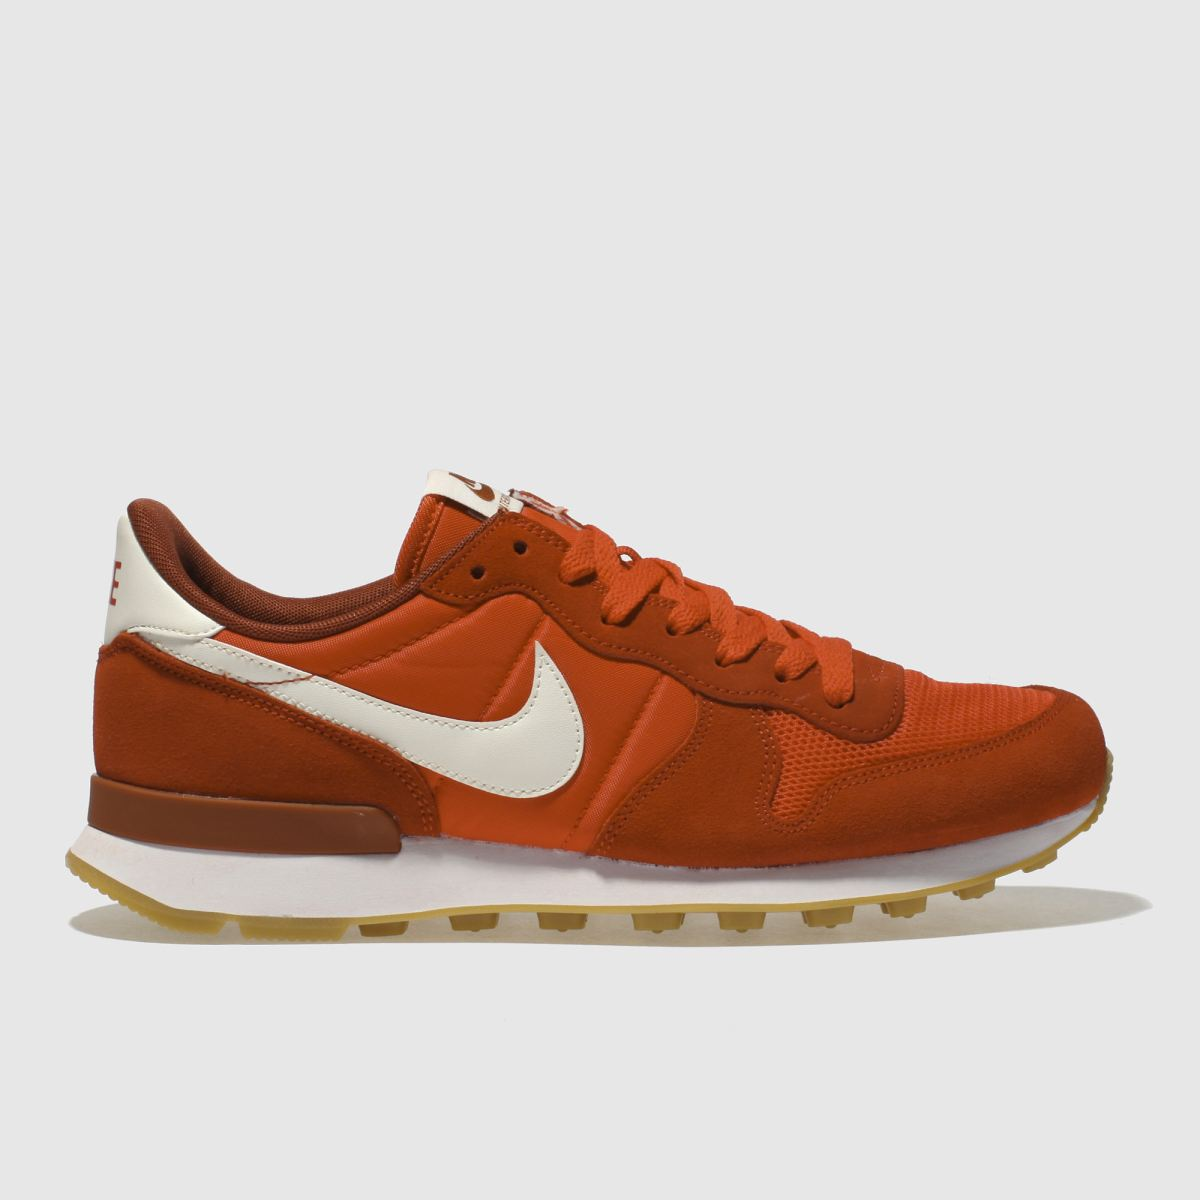 Nike Red Internationalist Trainers